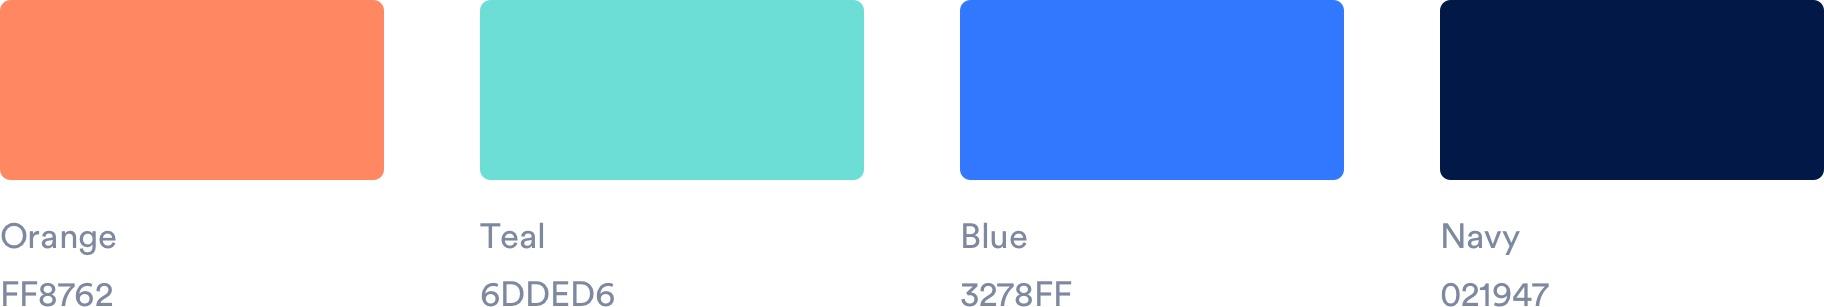 Colors-1